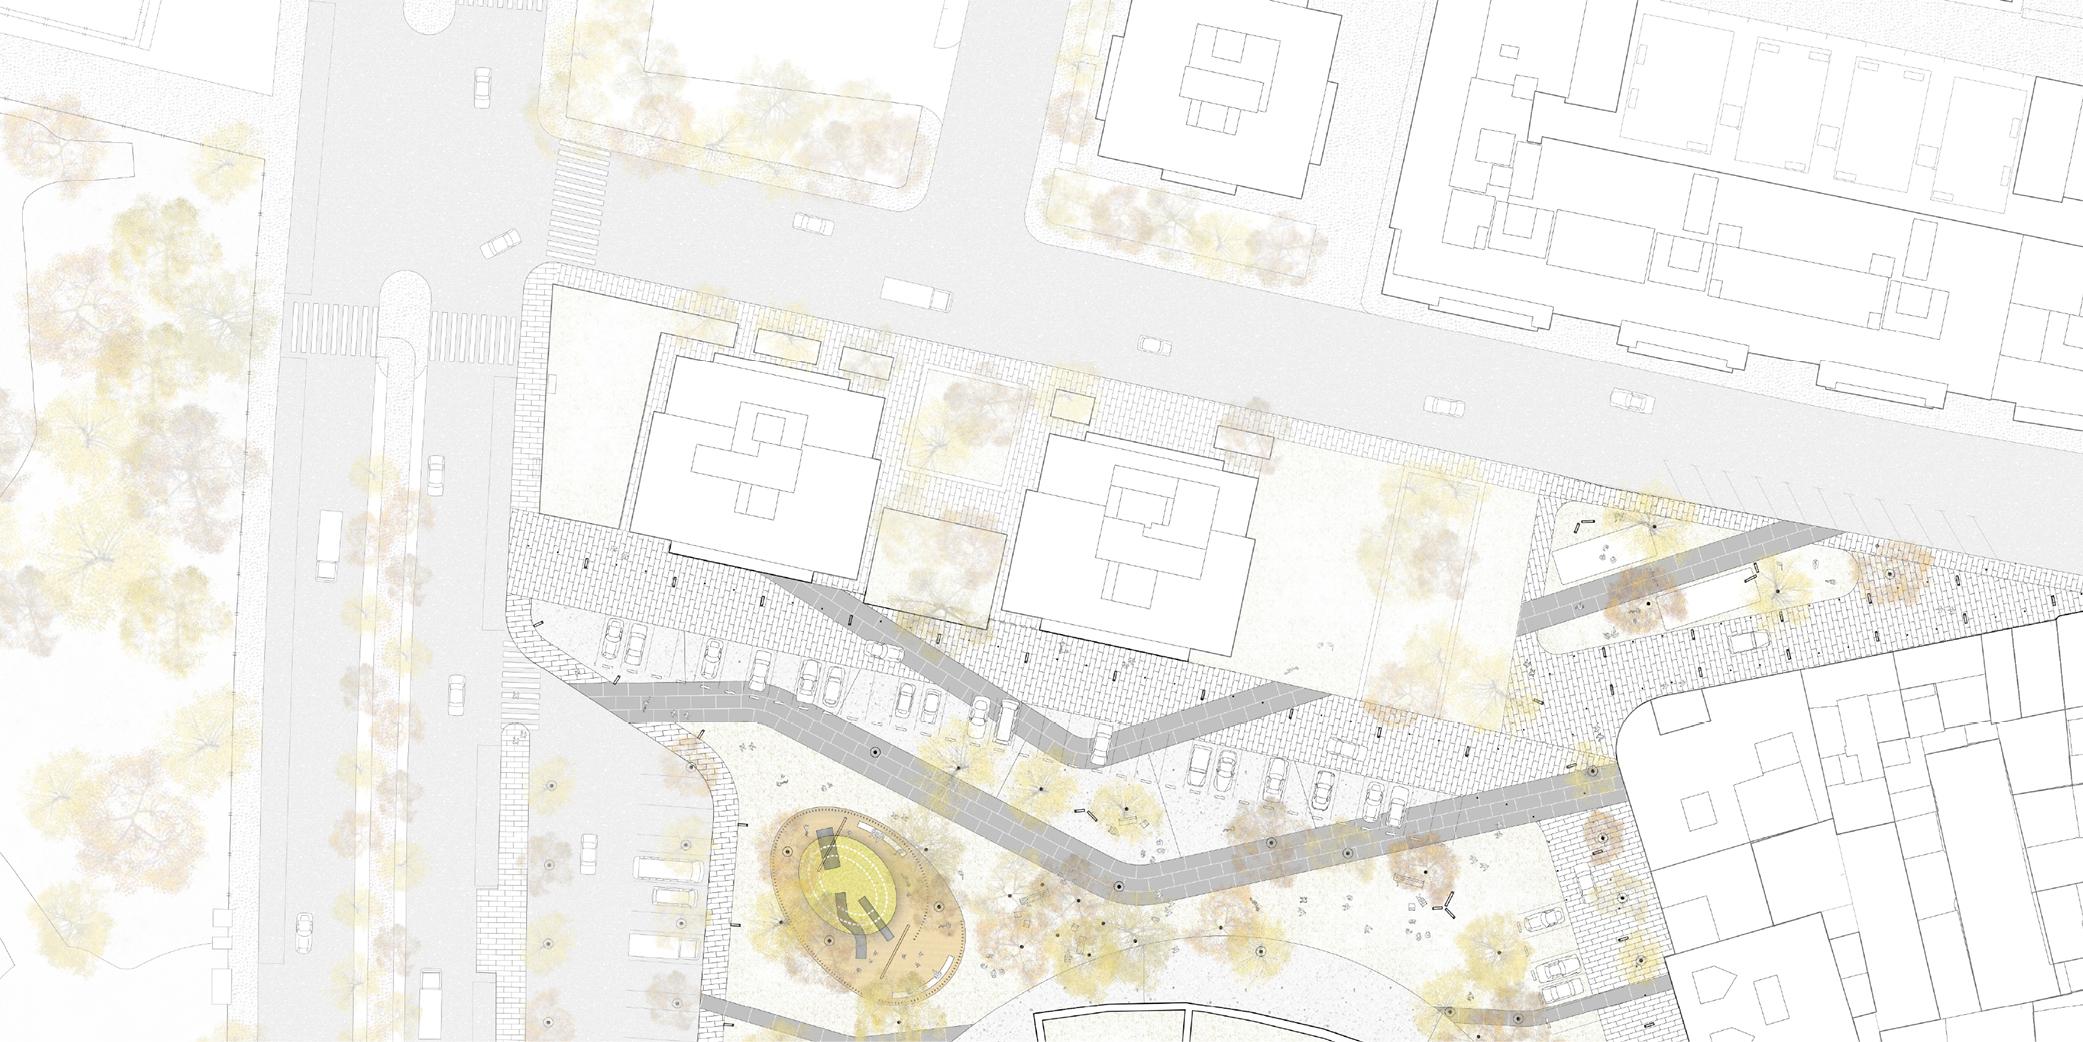 OCA architects concurso arquitectura urbanizacion entorno plaza de toros de Alcazar de San Juan Hernan Lleida Ruiz Bernardo Garcia Morales Oscar Berbel13